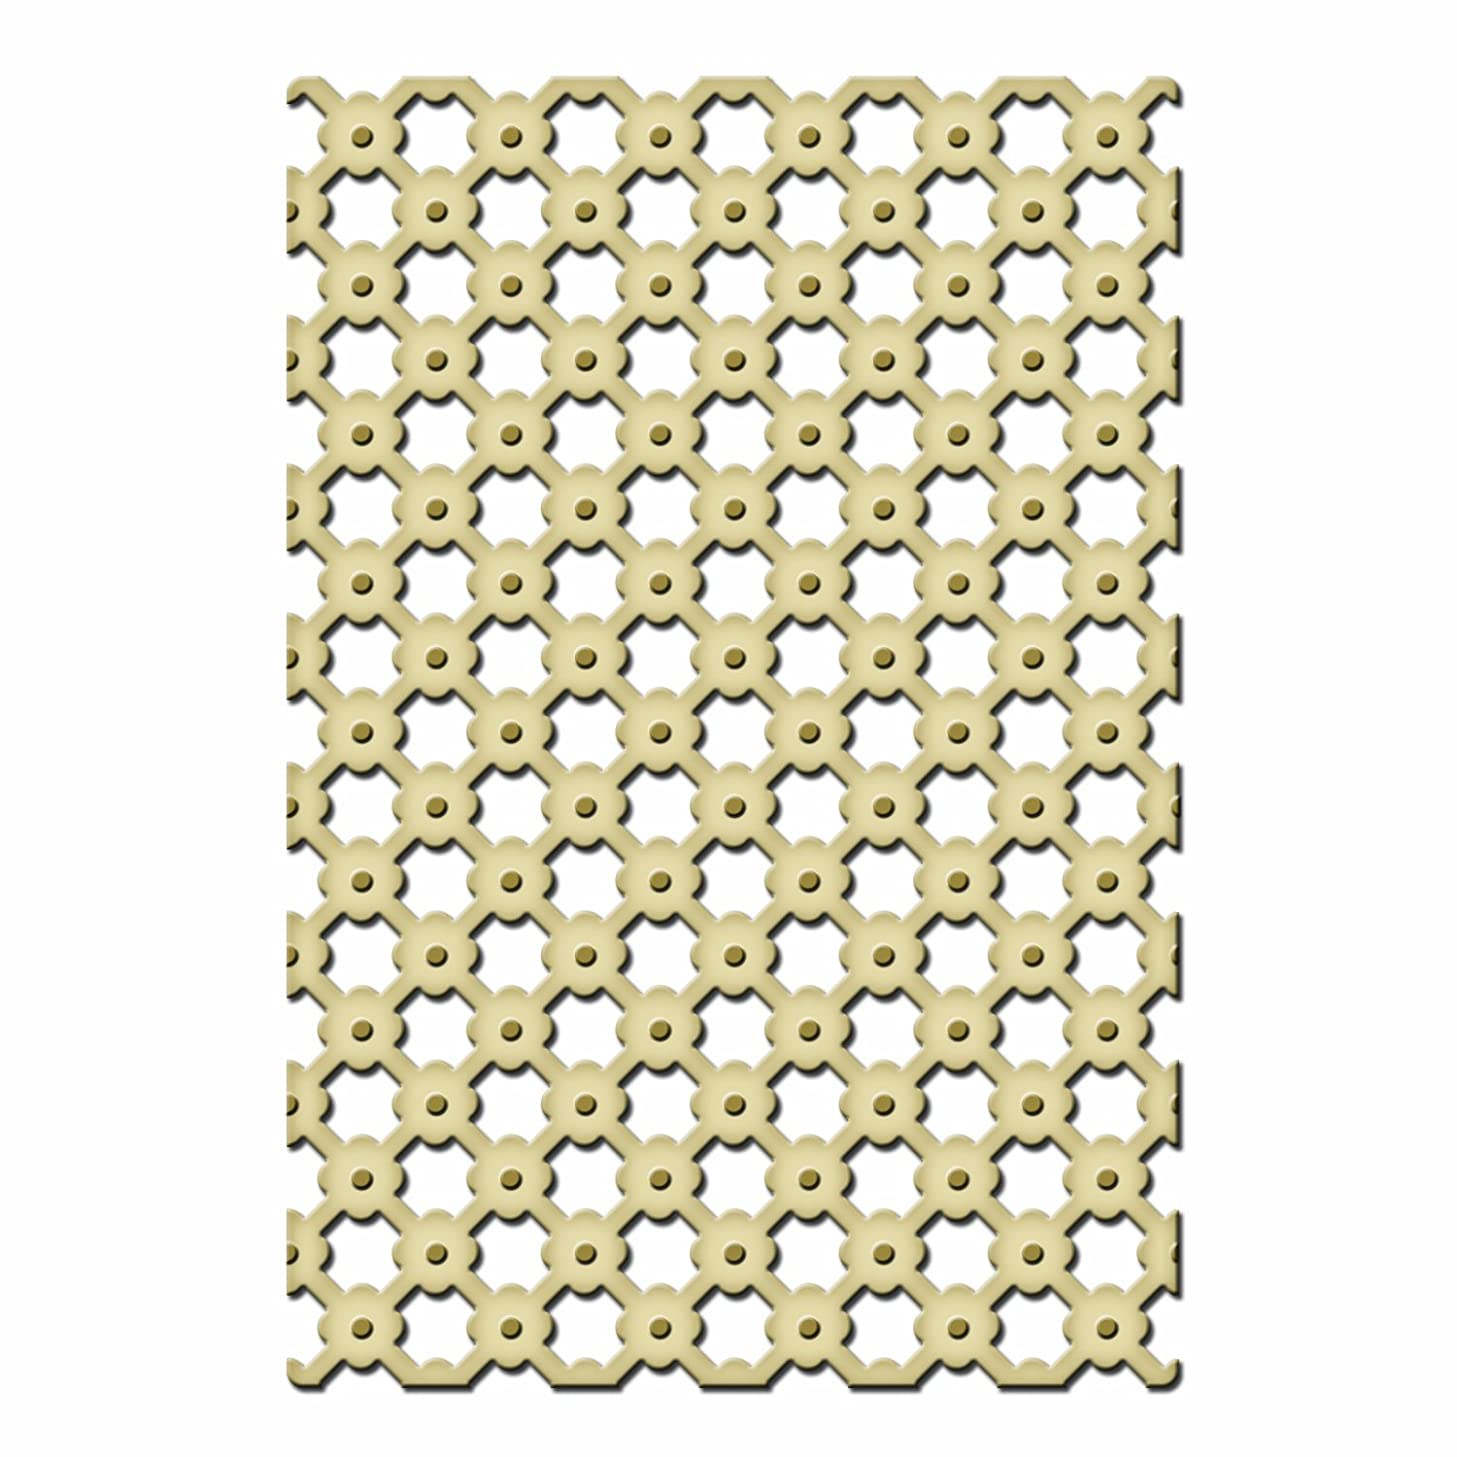 Spellbinders S5-197 Shapeabilities Crisscross Lace Die Templates